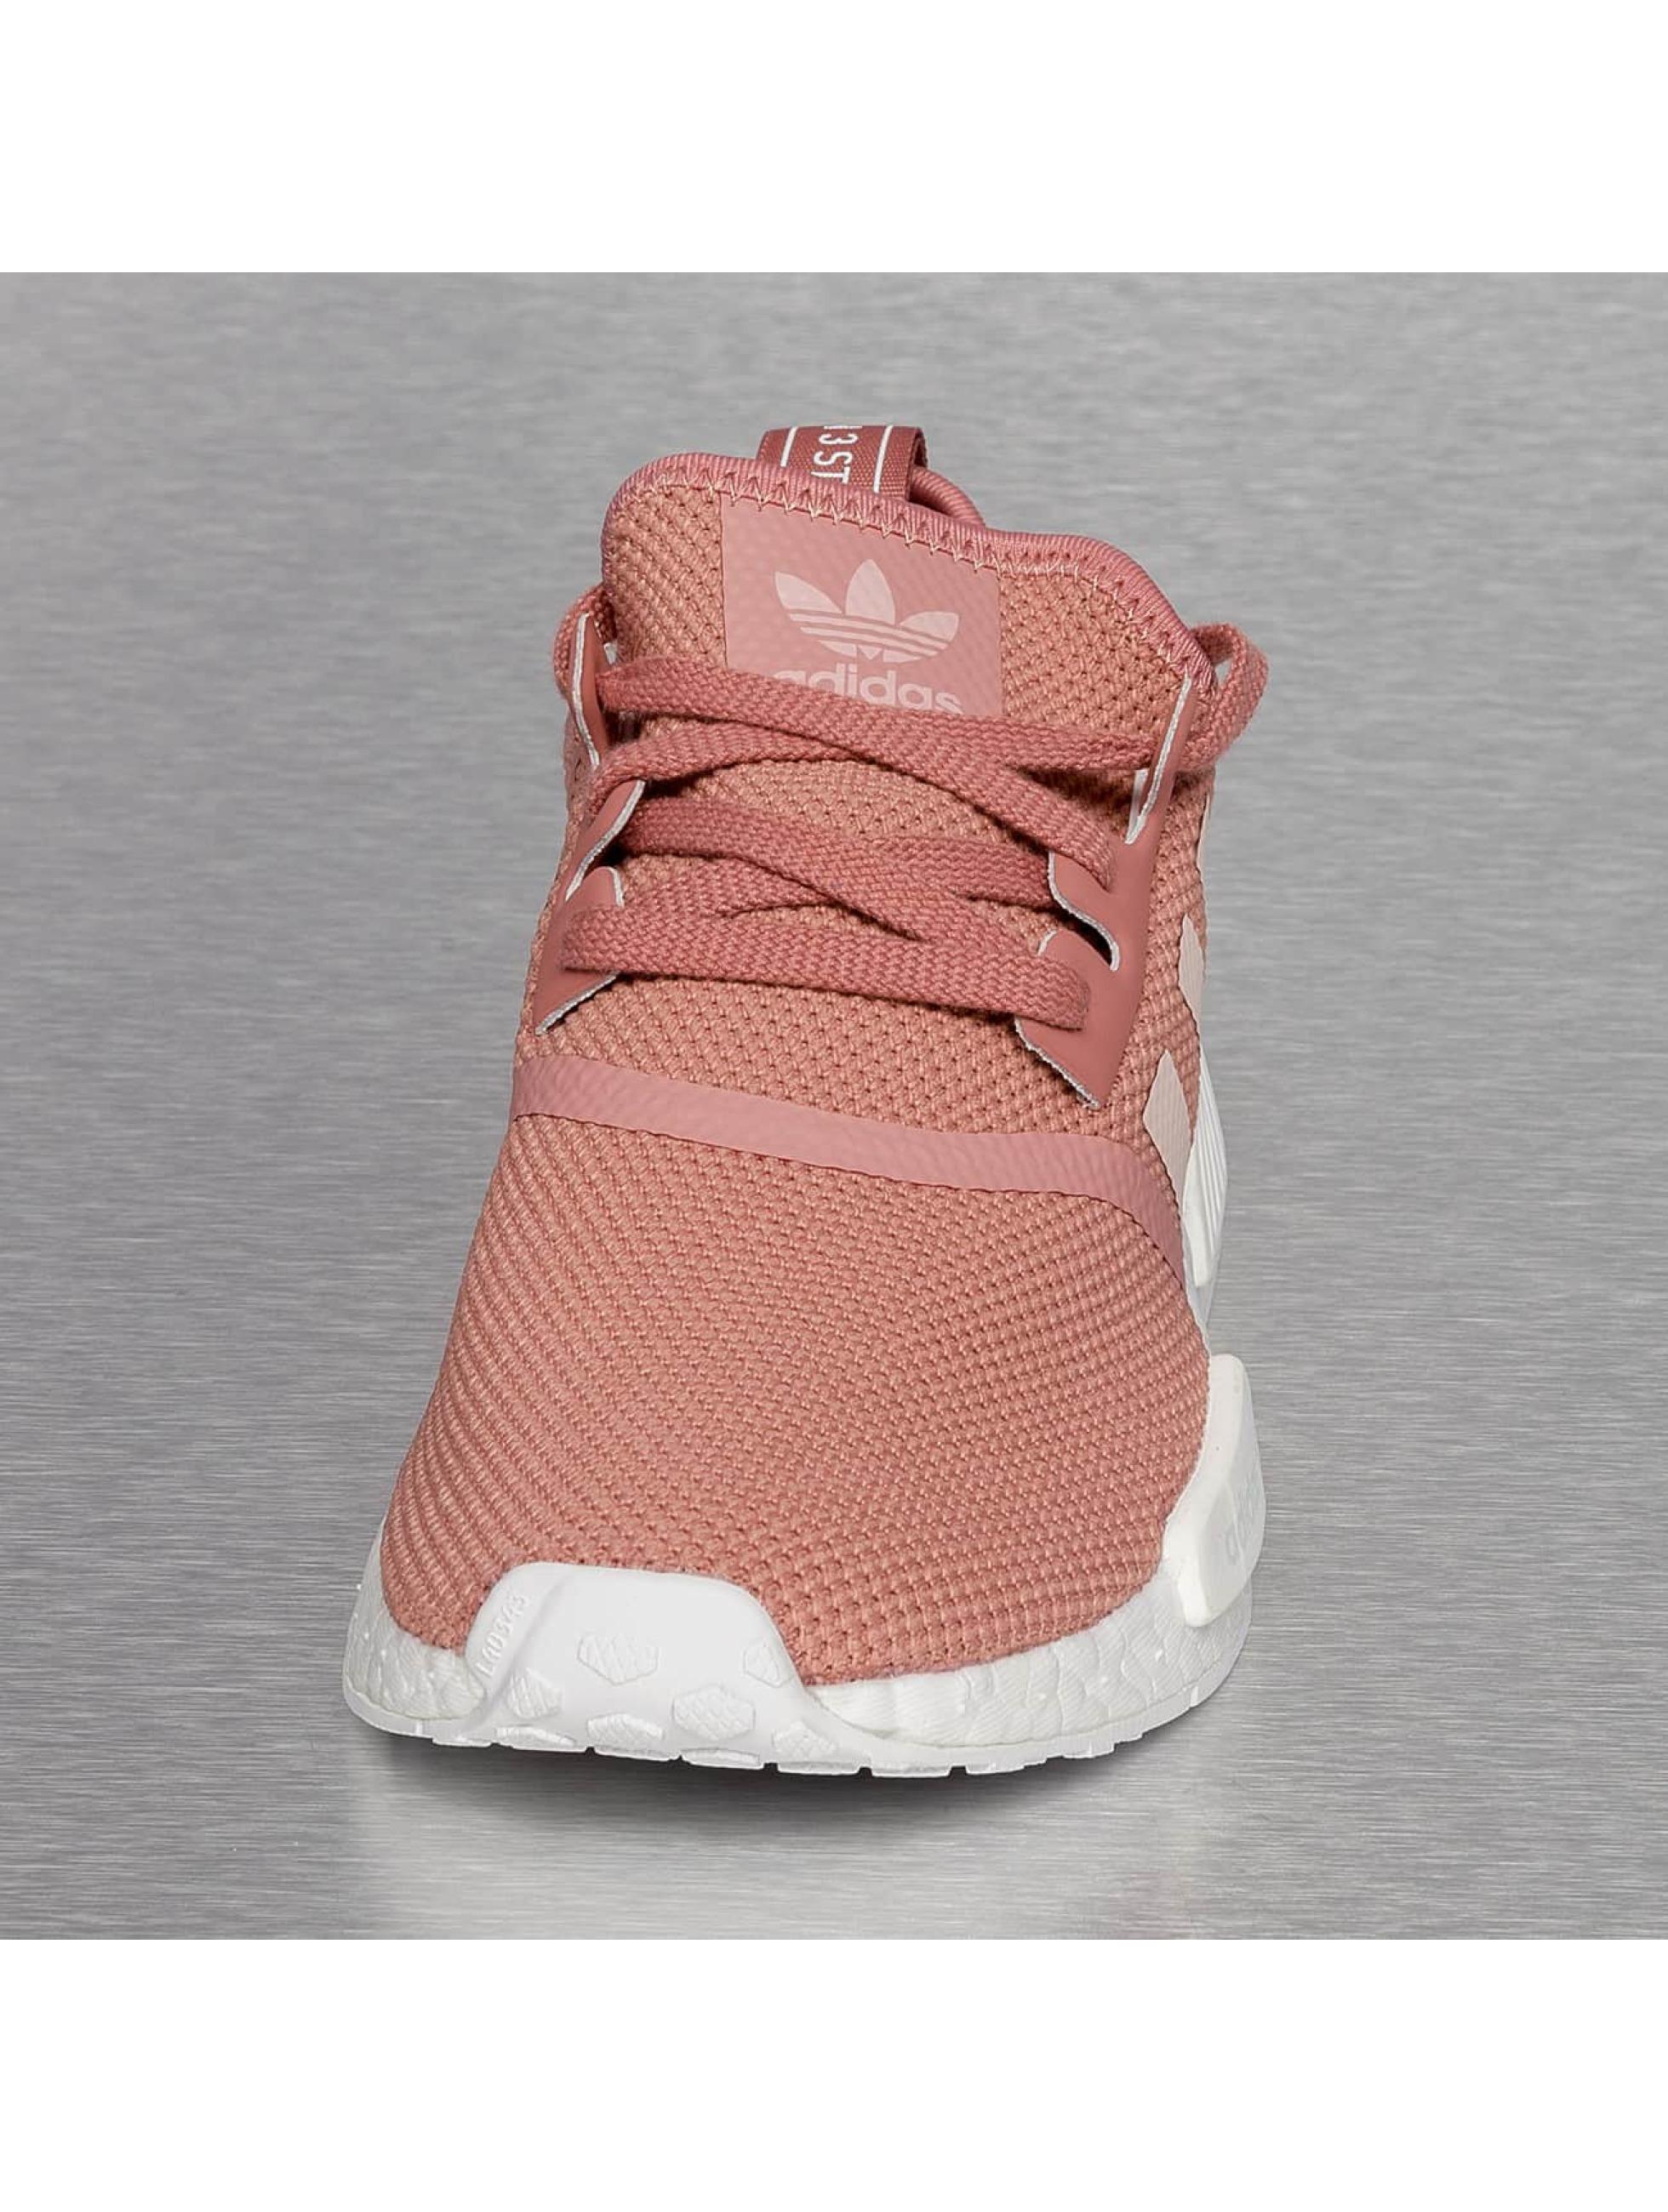 adidas nmd r1 damen raw pink bellevue. Black Bedroom Furniture Sets. Home Design Ideas